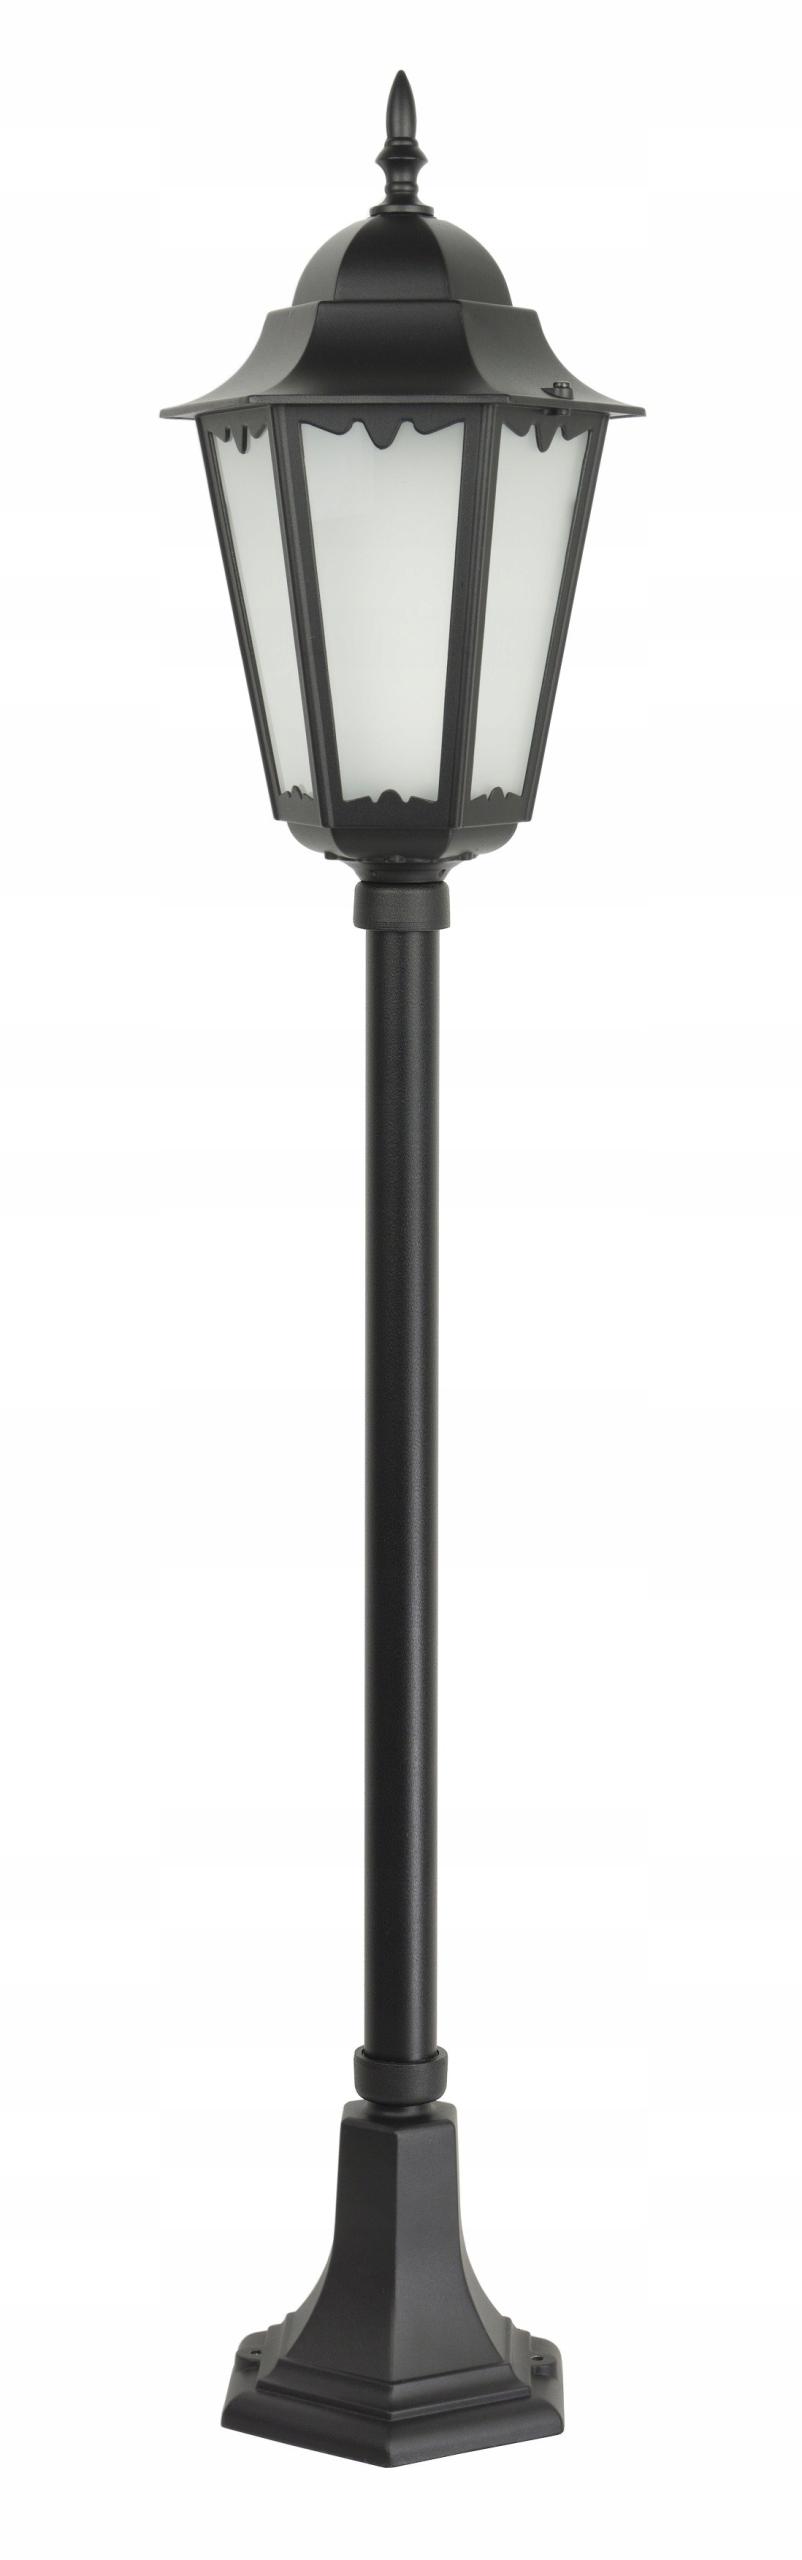 Vonkajšia podlahová lampa Retro Classic II 115 cm